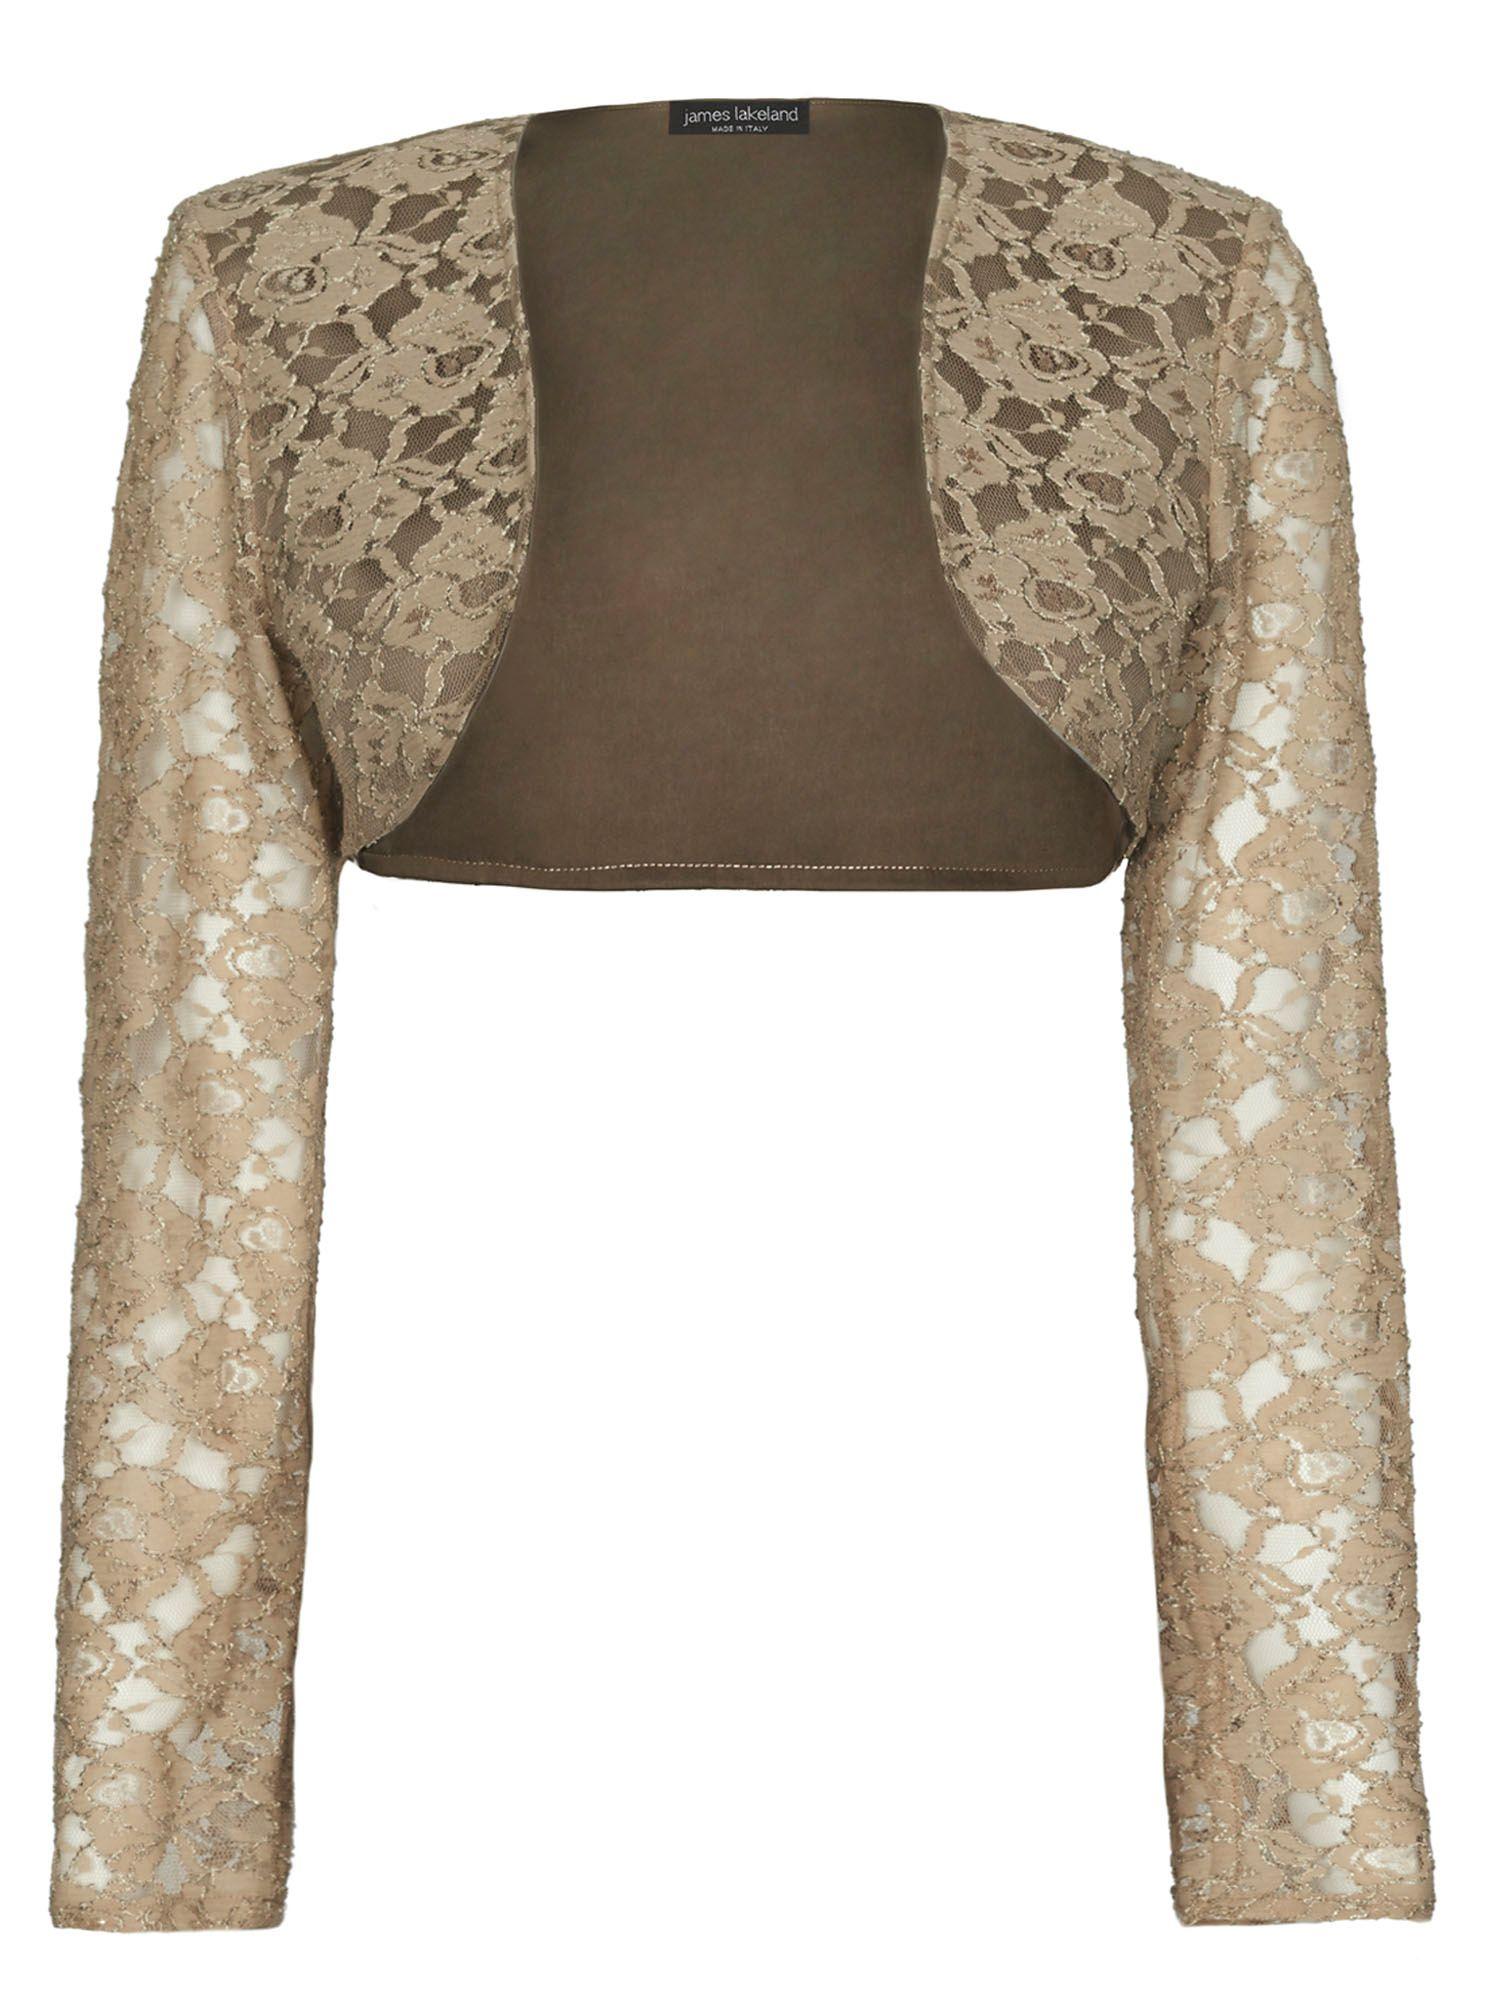 james lakeland lace bolero in beige lyst. Black Bedroom Furniture Sets. Home Design Ideas